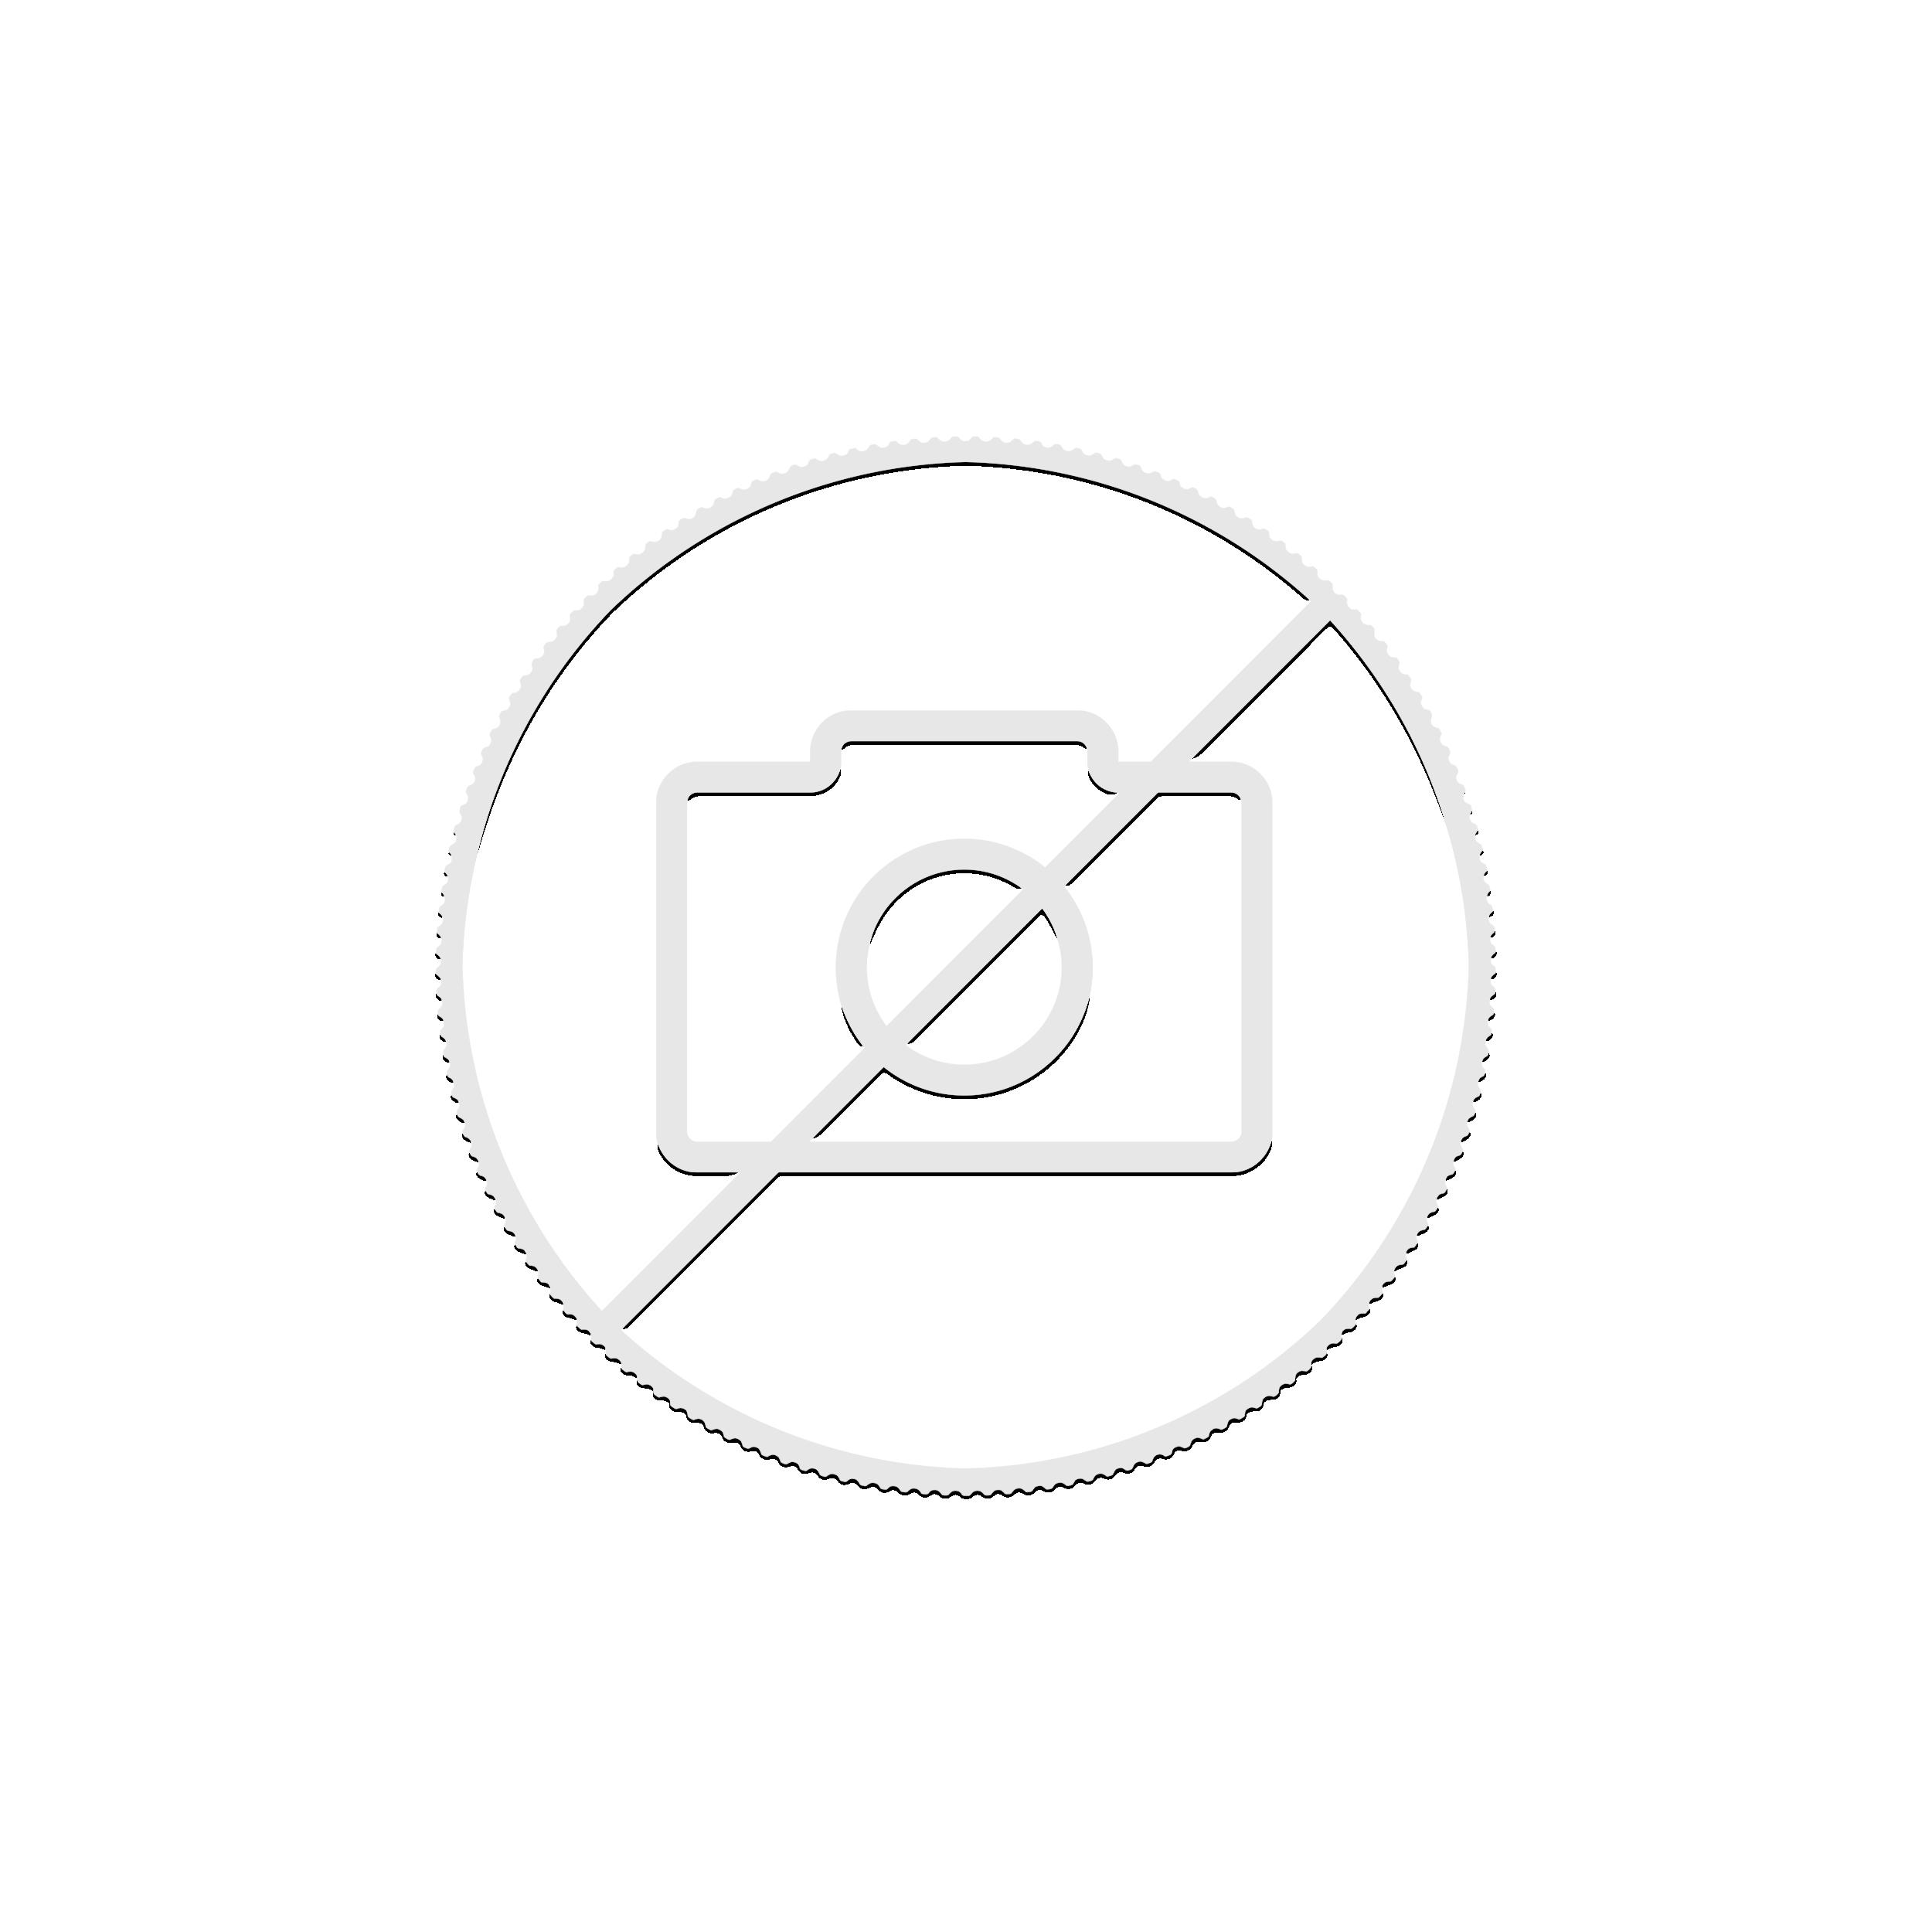 1 troy ounce silver coin Goldzilla 2021